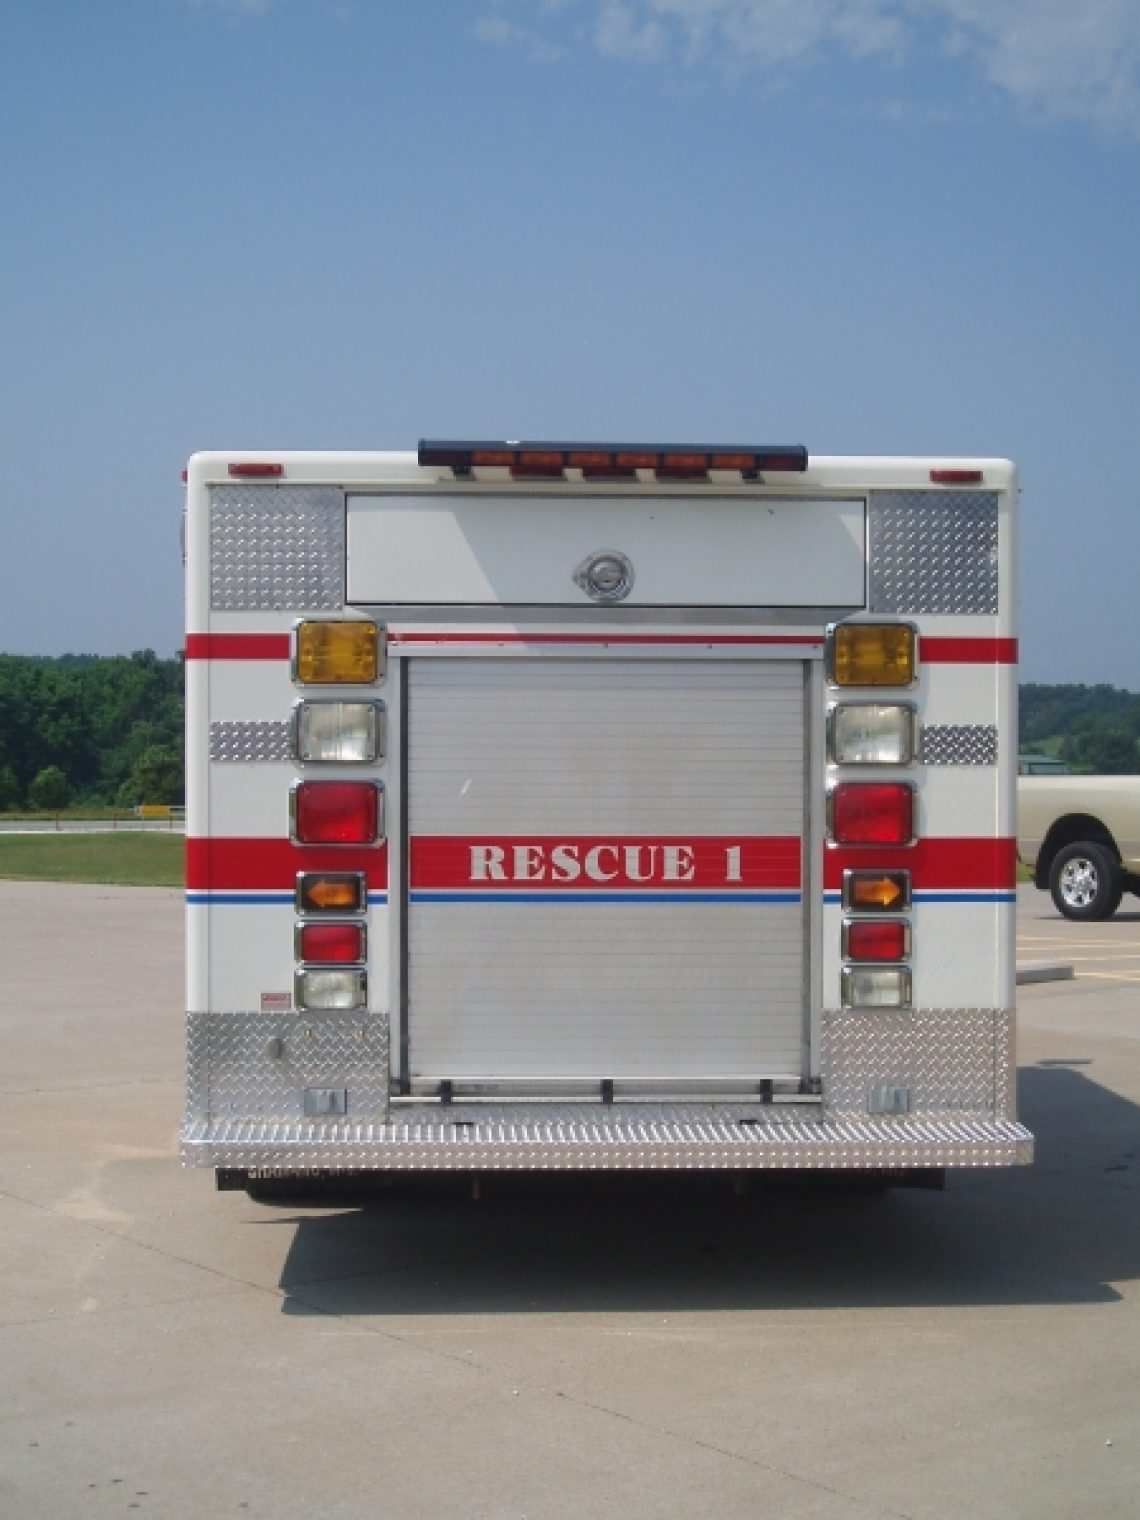 1997 Ford F800 Walk-Around Rescue